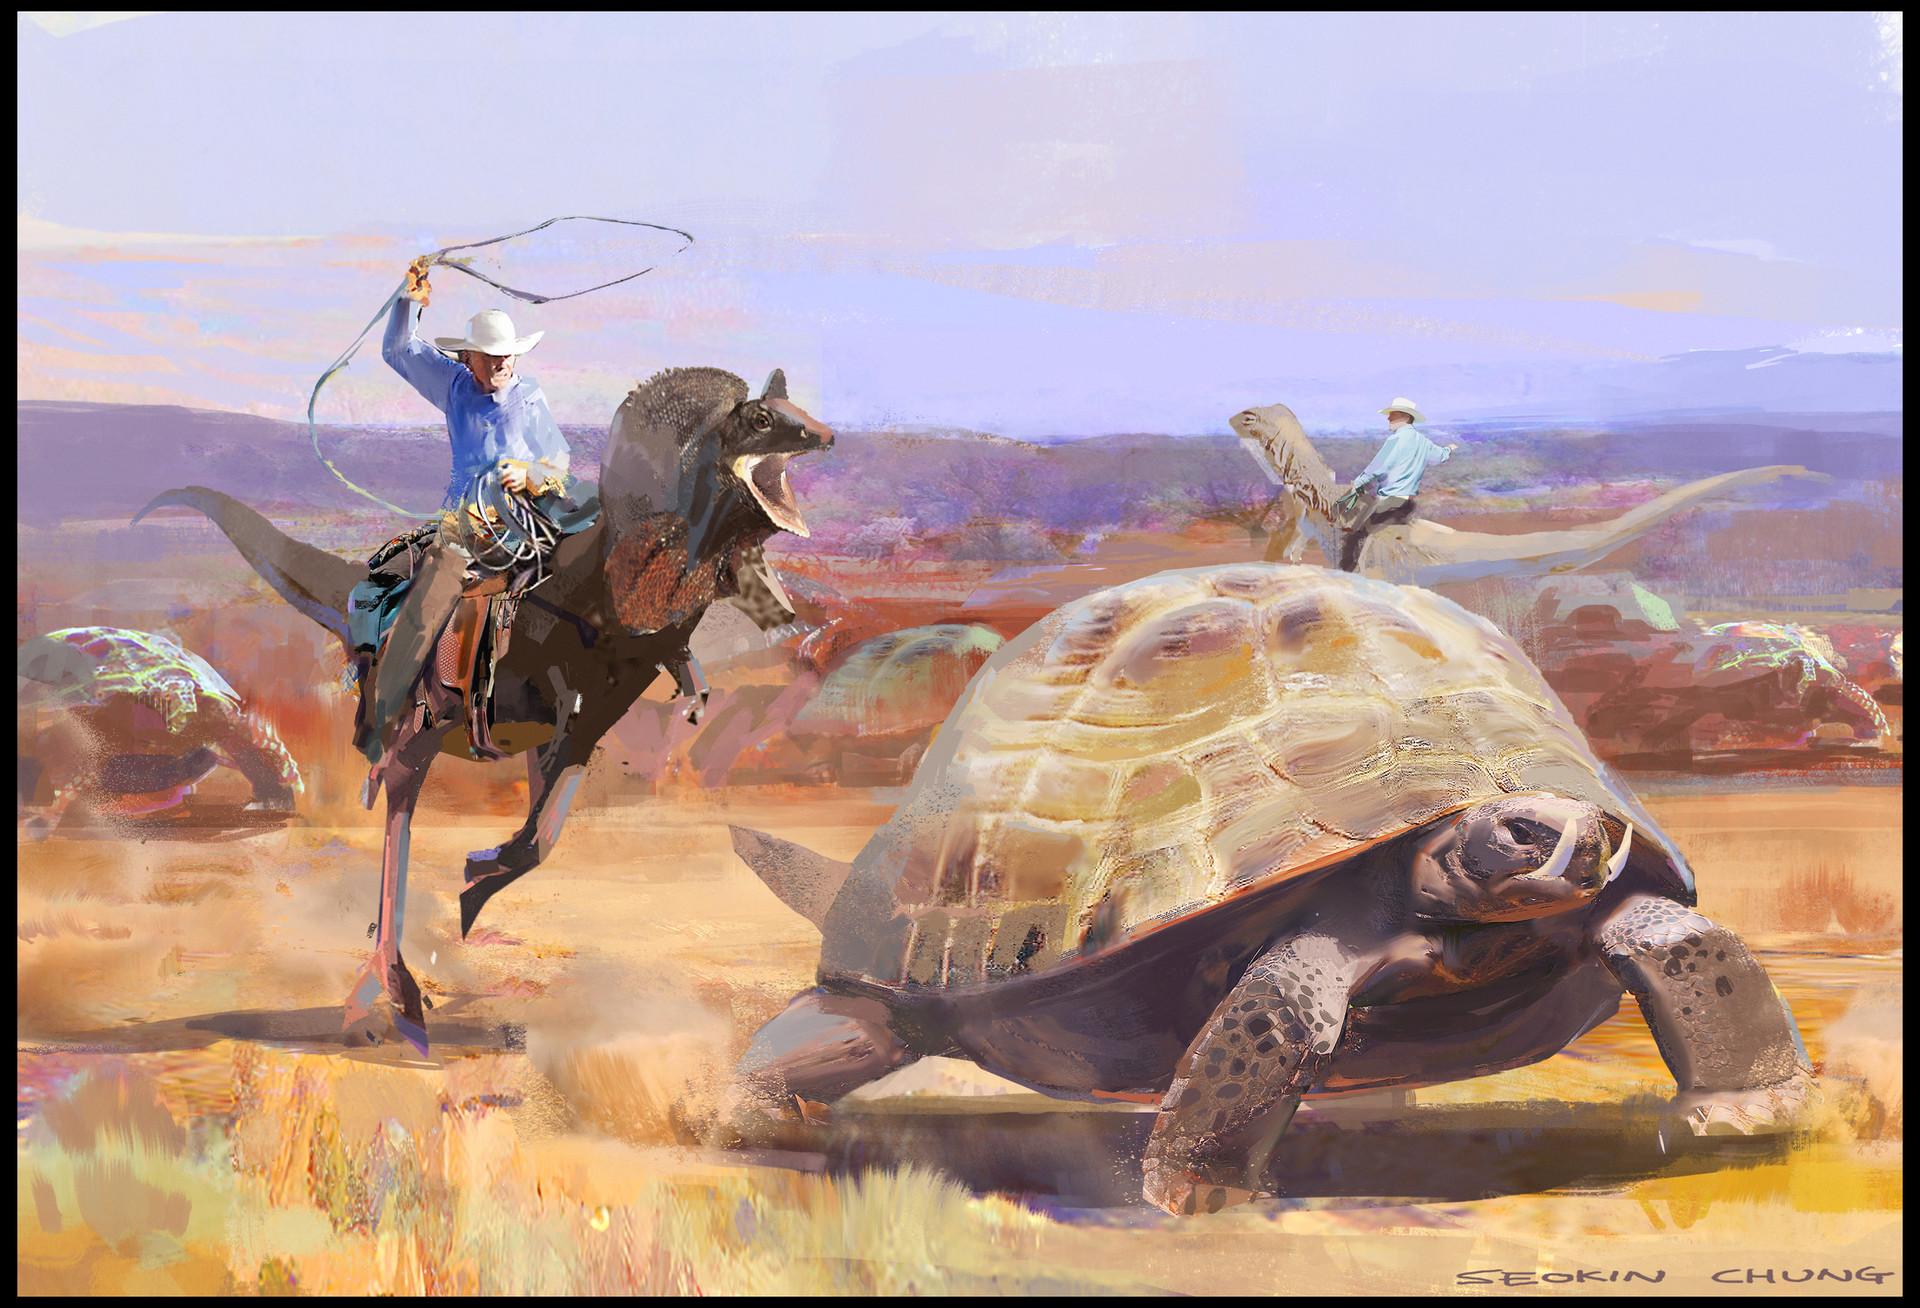 seokin-chung-turtleboys.jpg